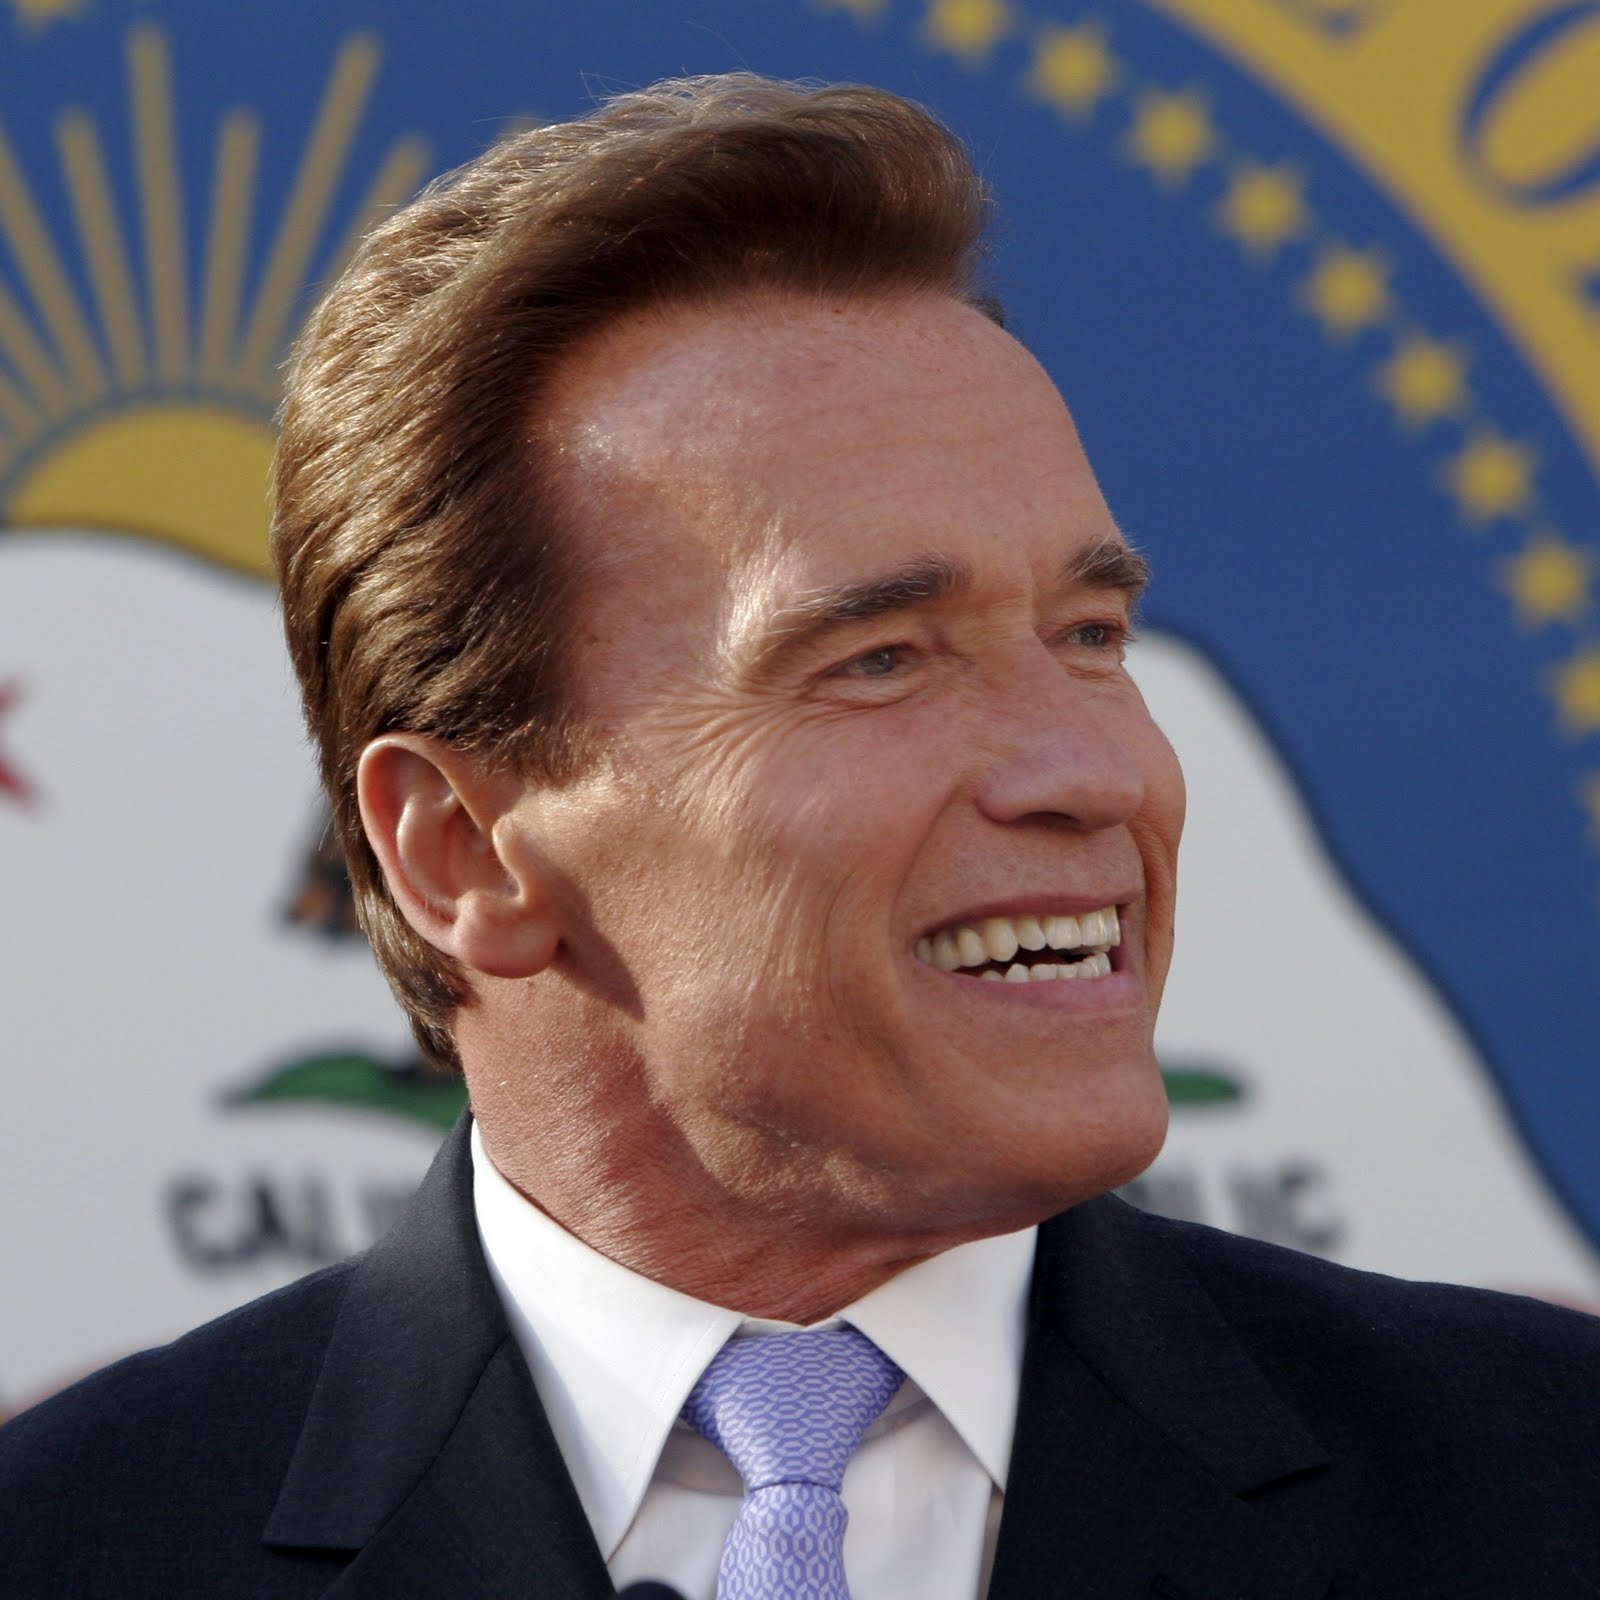 http://3.bp.blogspot.com/_fKL0UKYAgHc/TFI7B-abzRI/AAAAAAAAAyU/8a3n30I9J2U/s1600/Arnold+Schwarzenegger.jpg